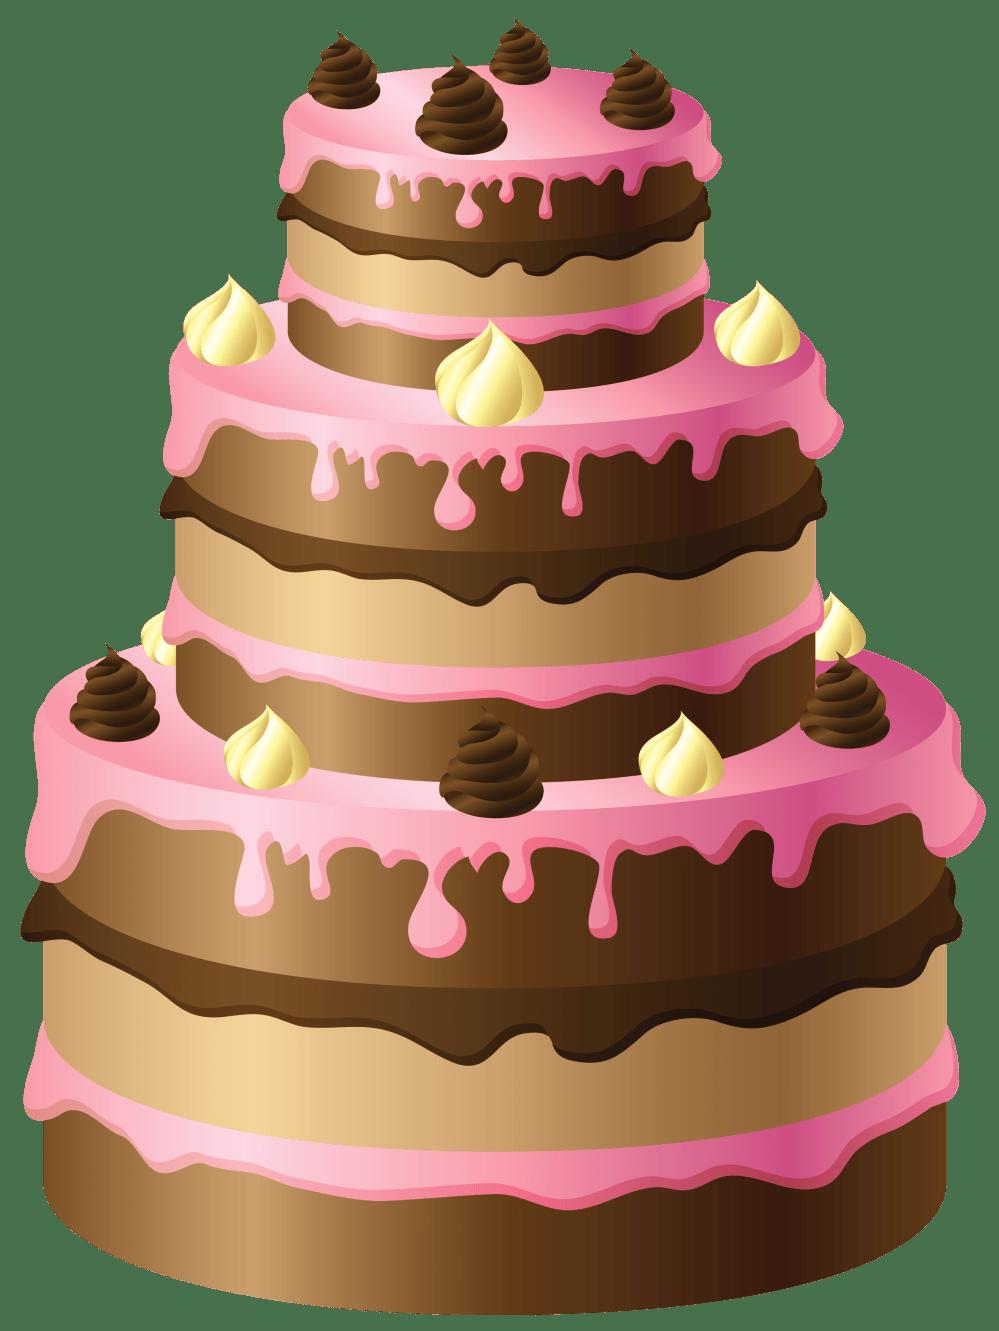 medium resolution of birthday cake clip art free birthday cake clipart 2